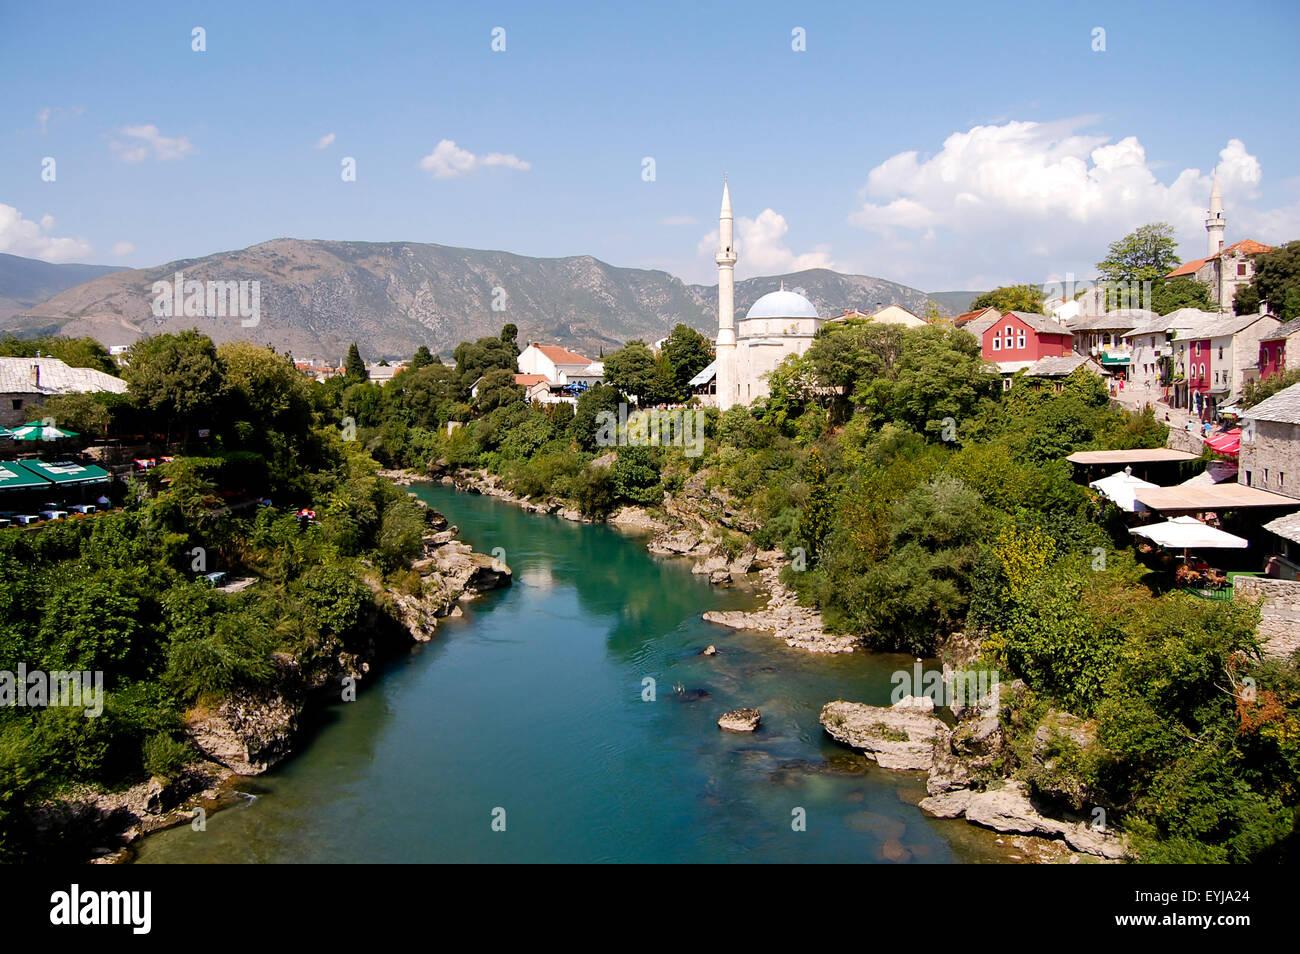 Mostar - Bosnia-Herzegovina - Stock Image